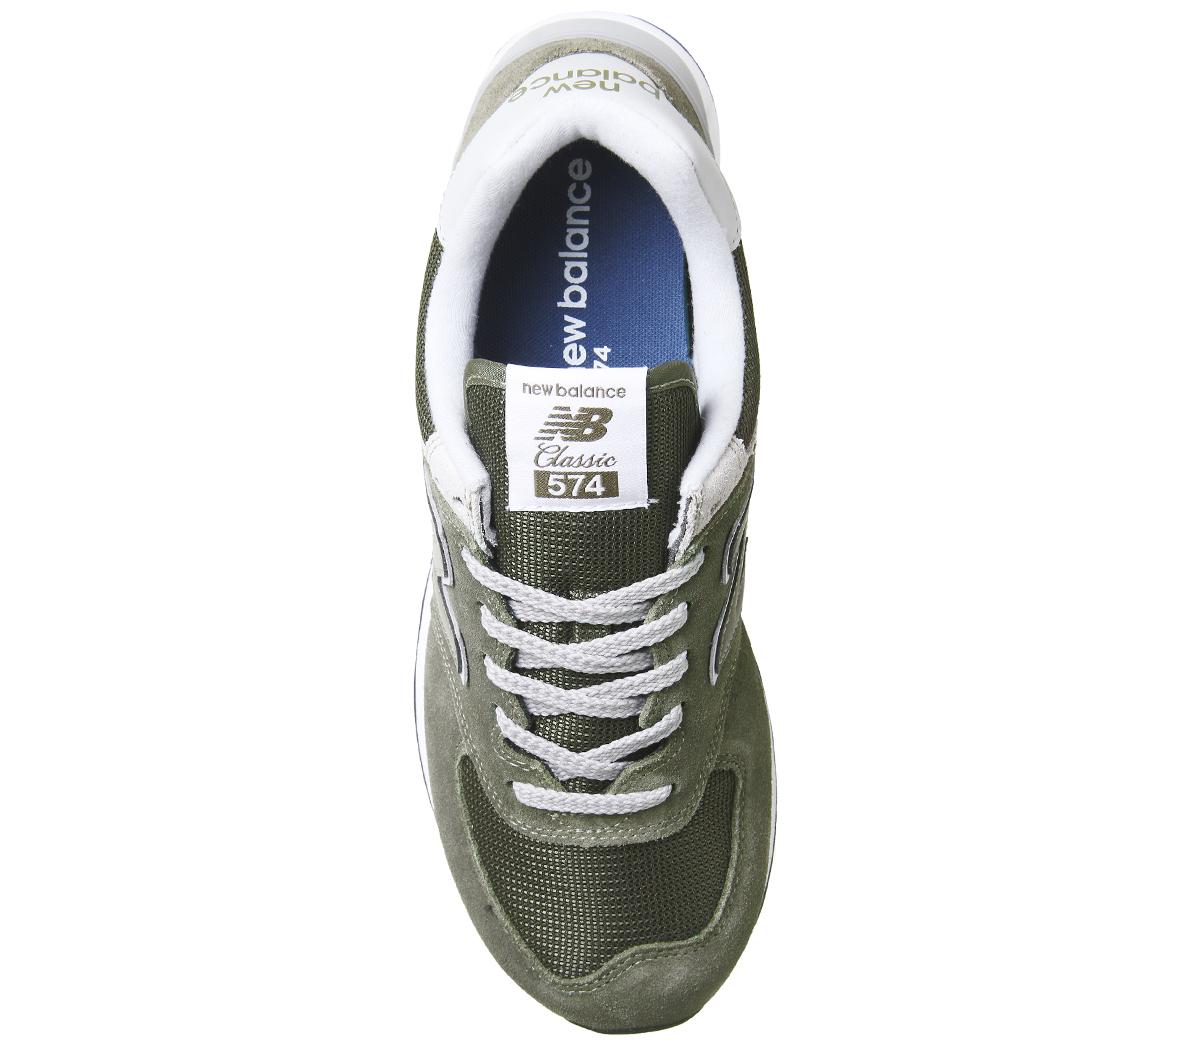 afb51fcab Sentinel New Balance 574 Trainers KHAKI Trainers Shoes